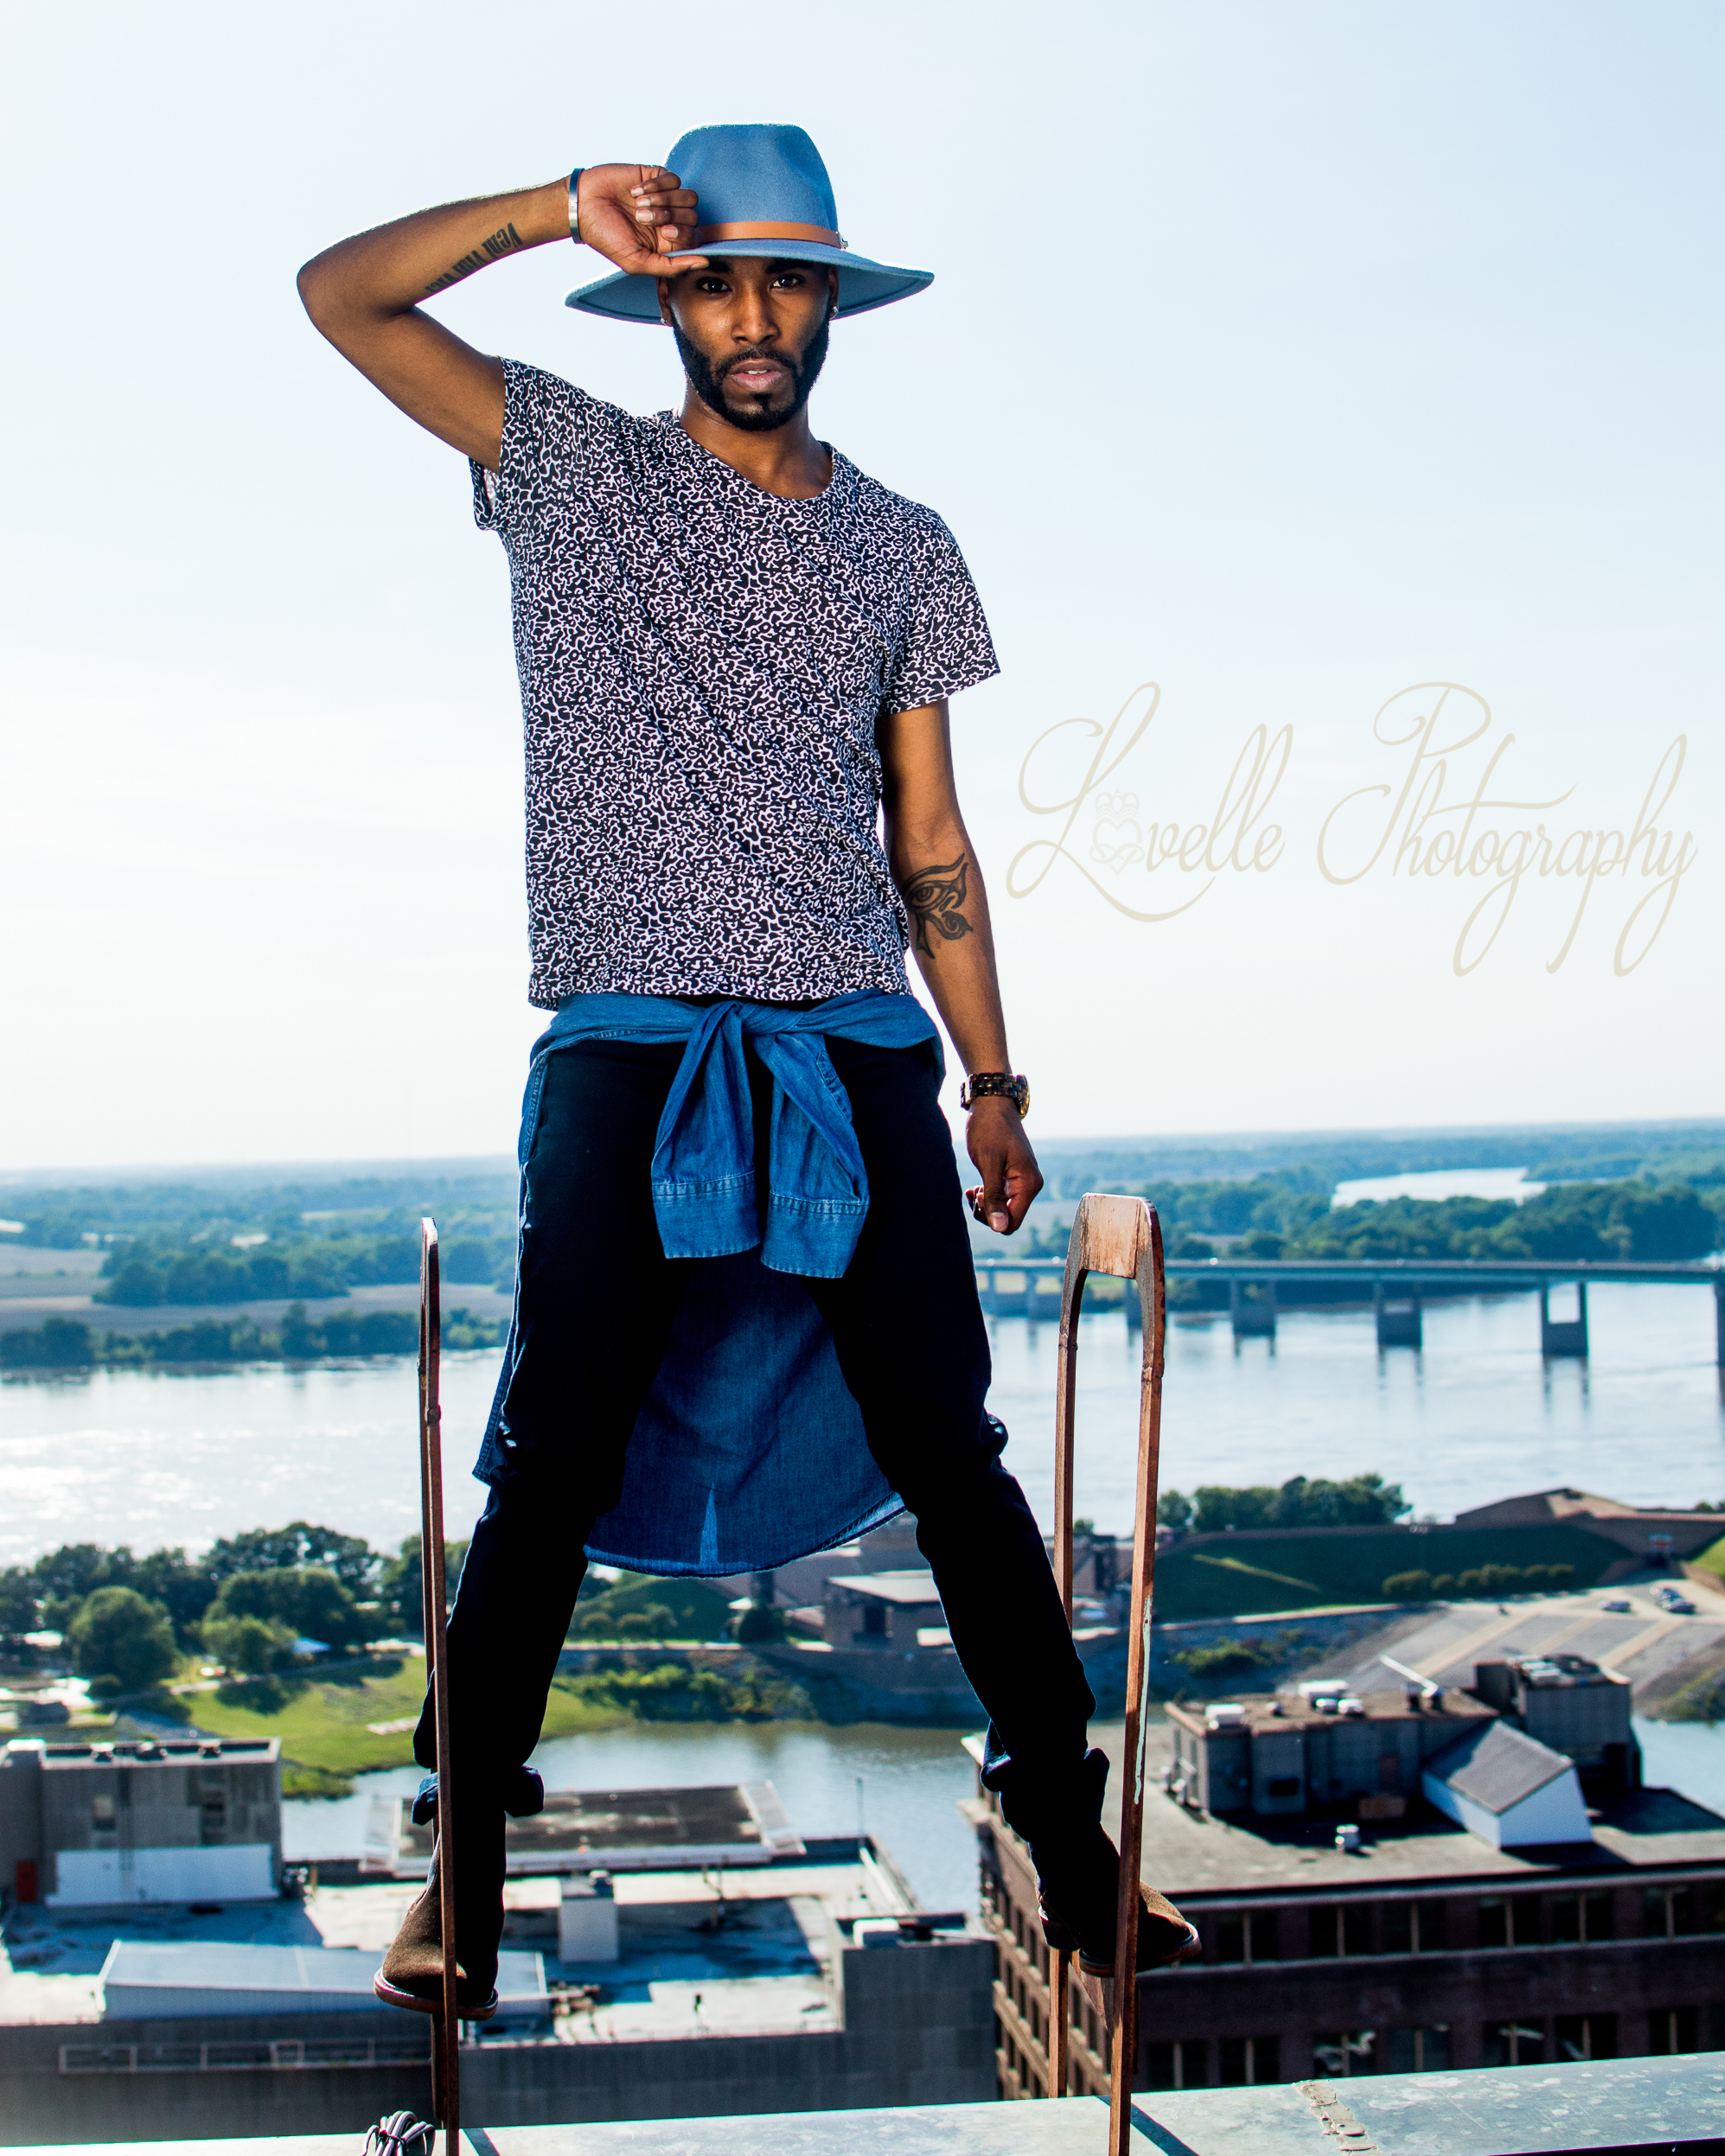 Model: Grant Kee